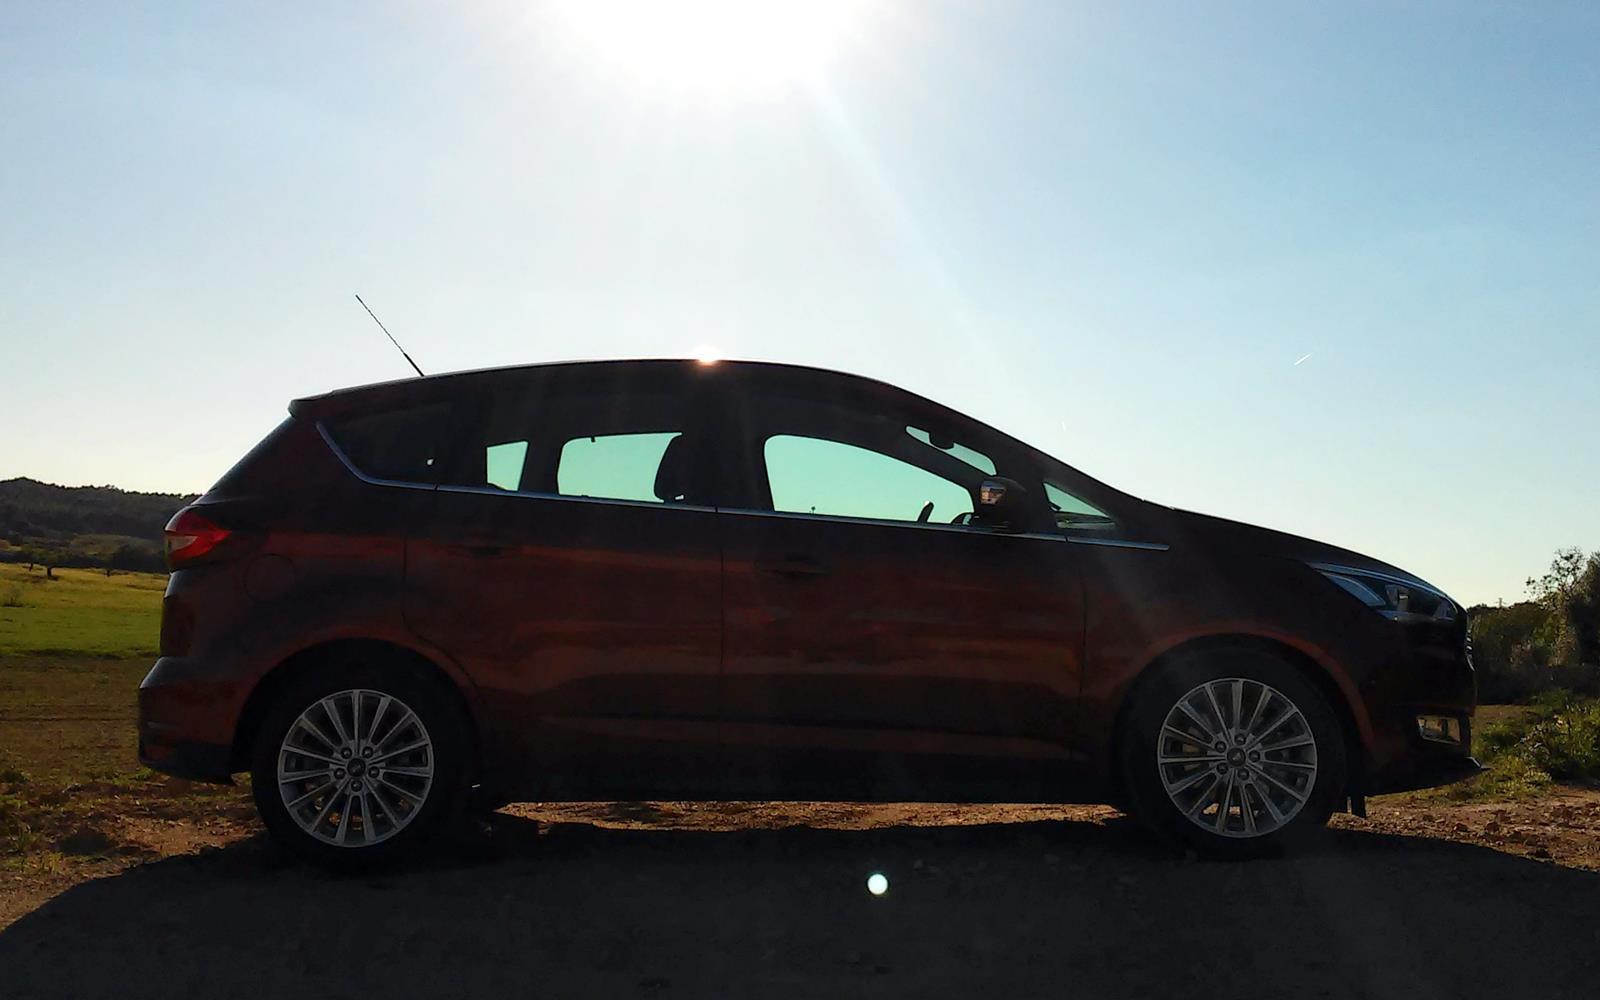 Ford C-Max 2015 Silhouette